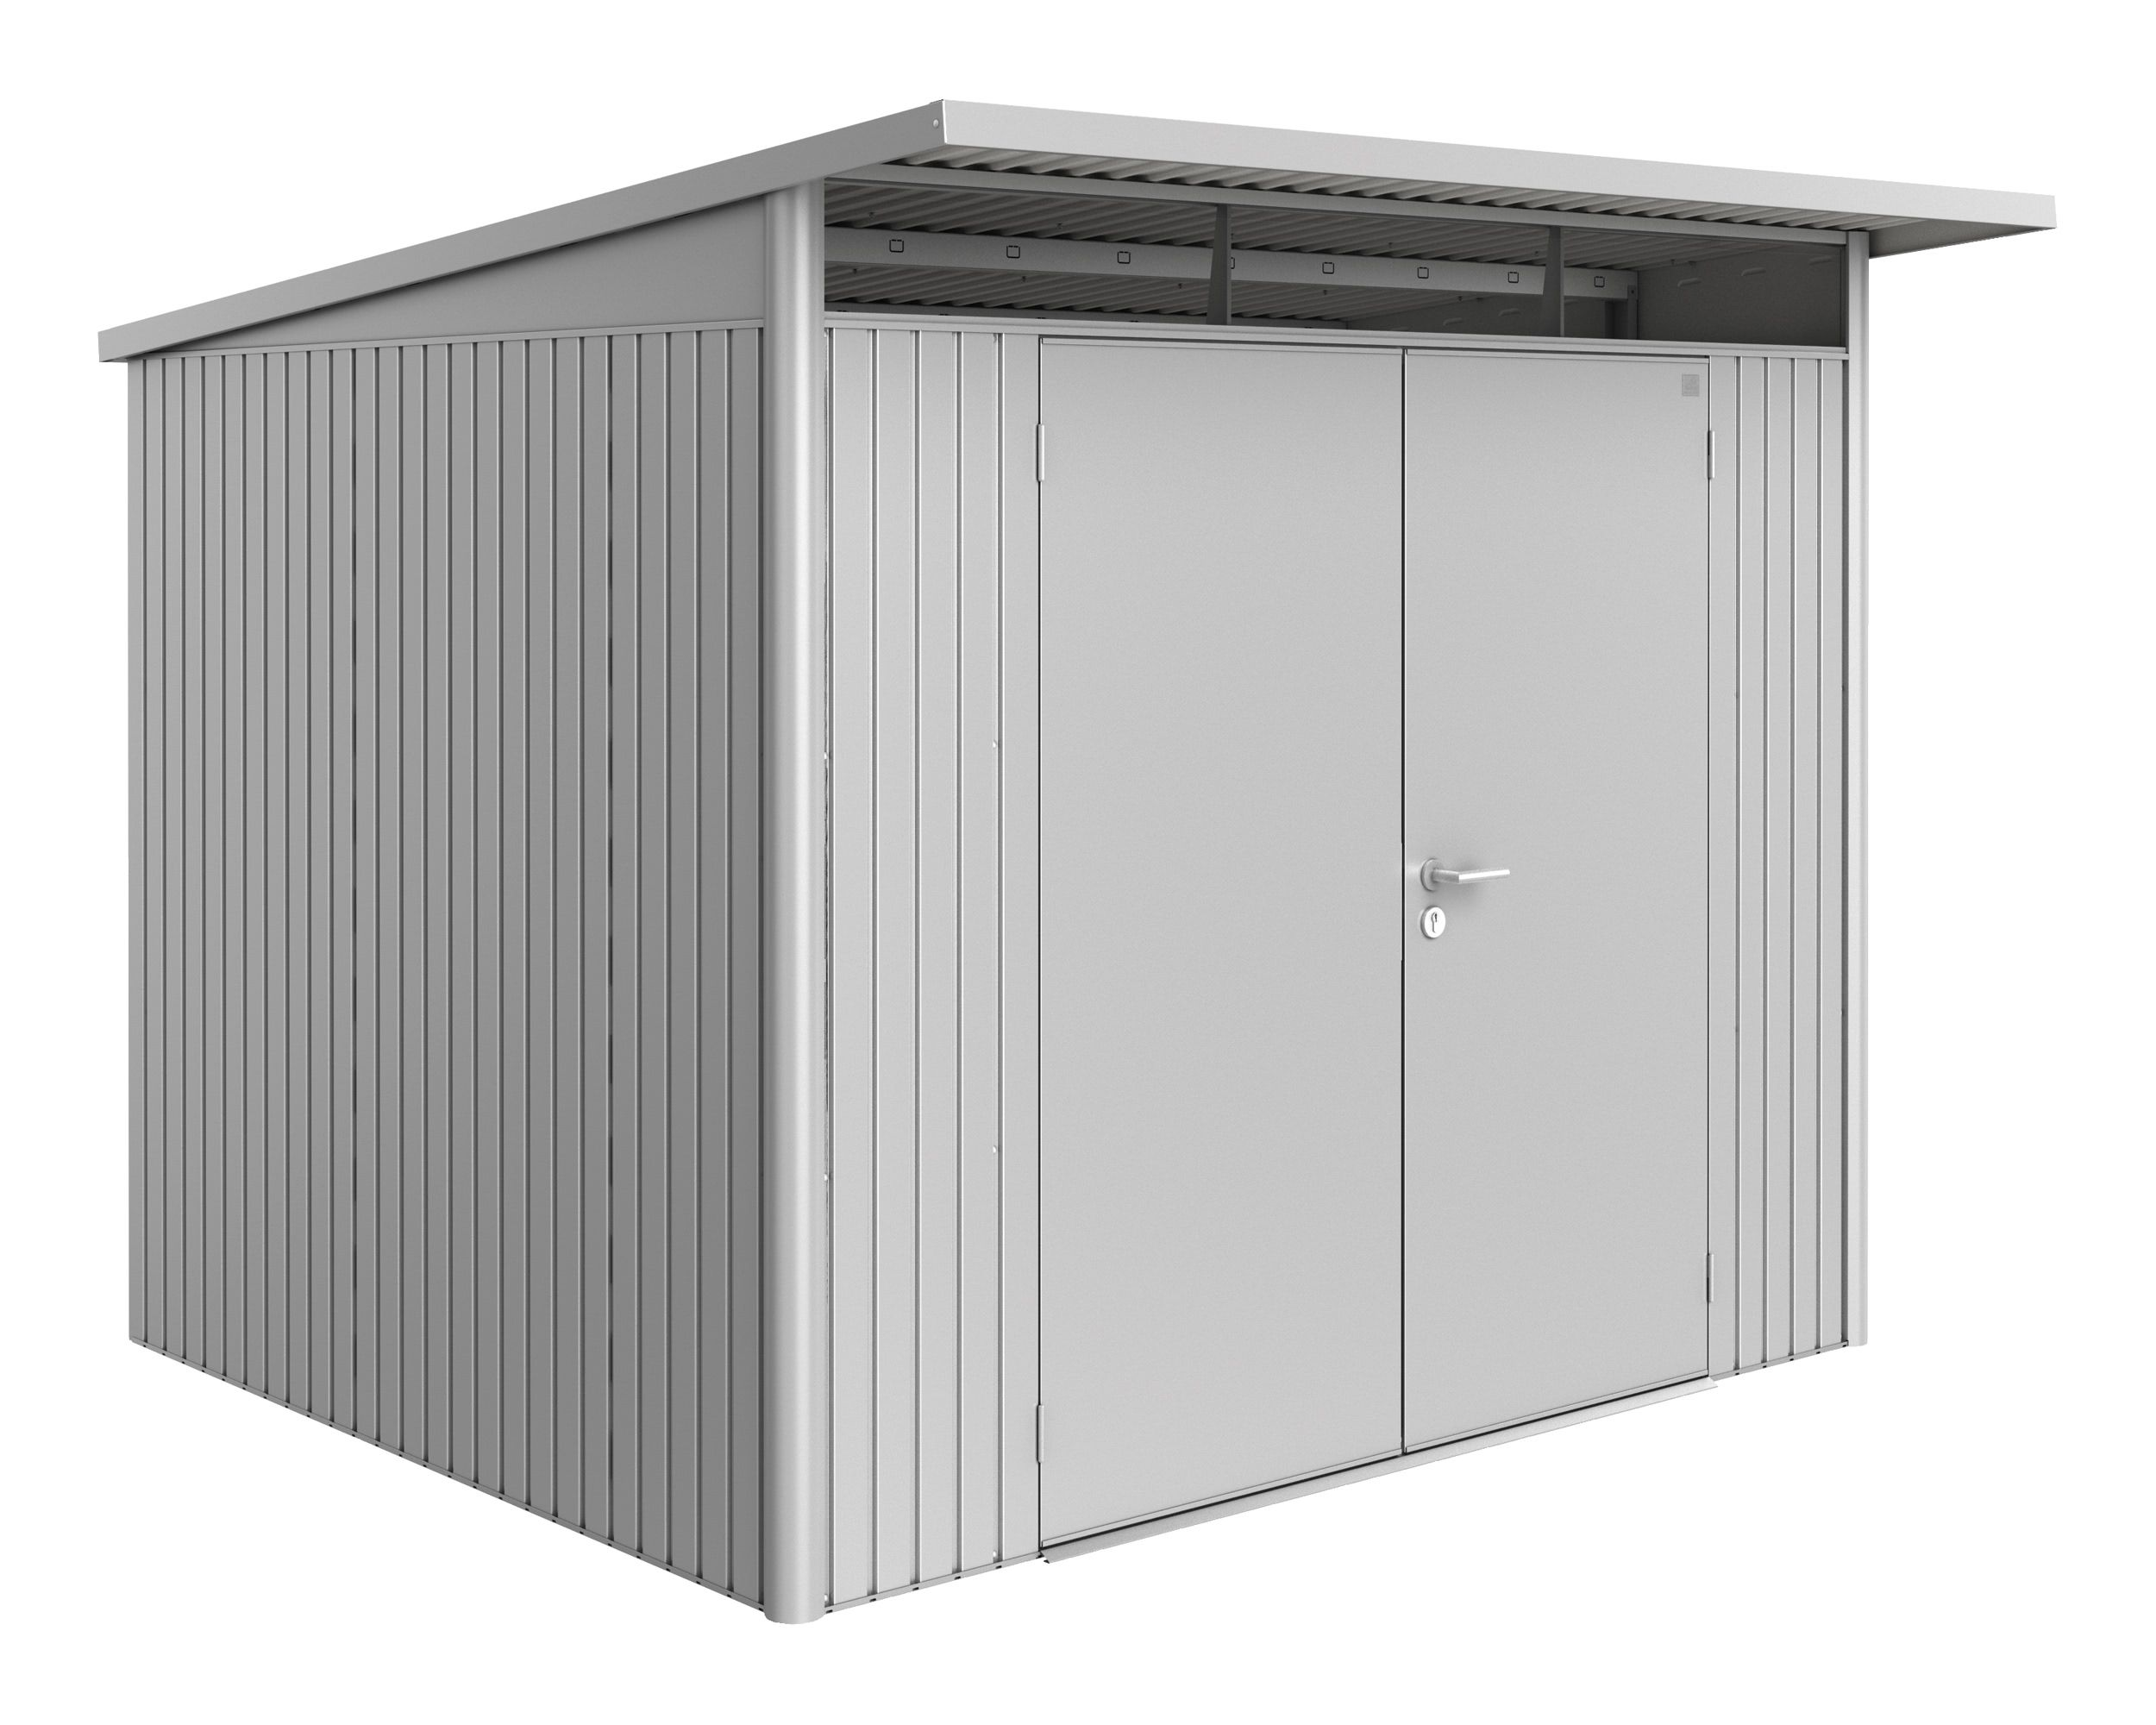 Gerätehaus Avantgarde A6, Doppeltüre